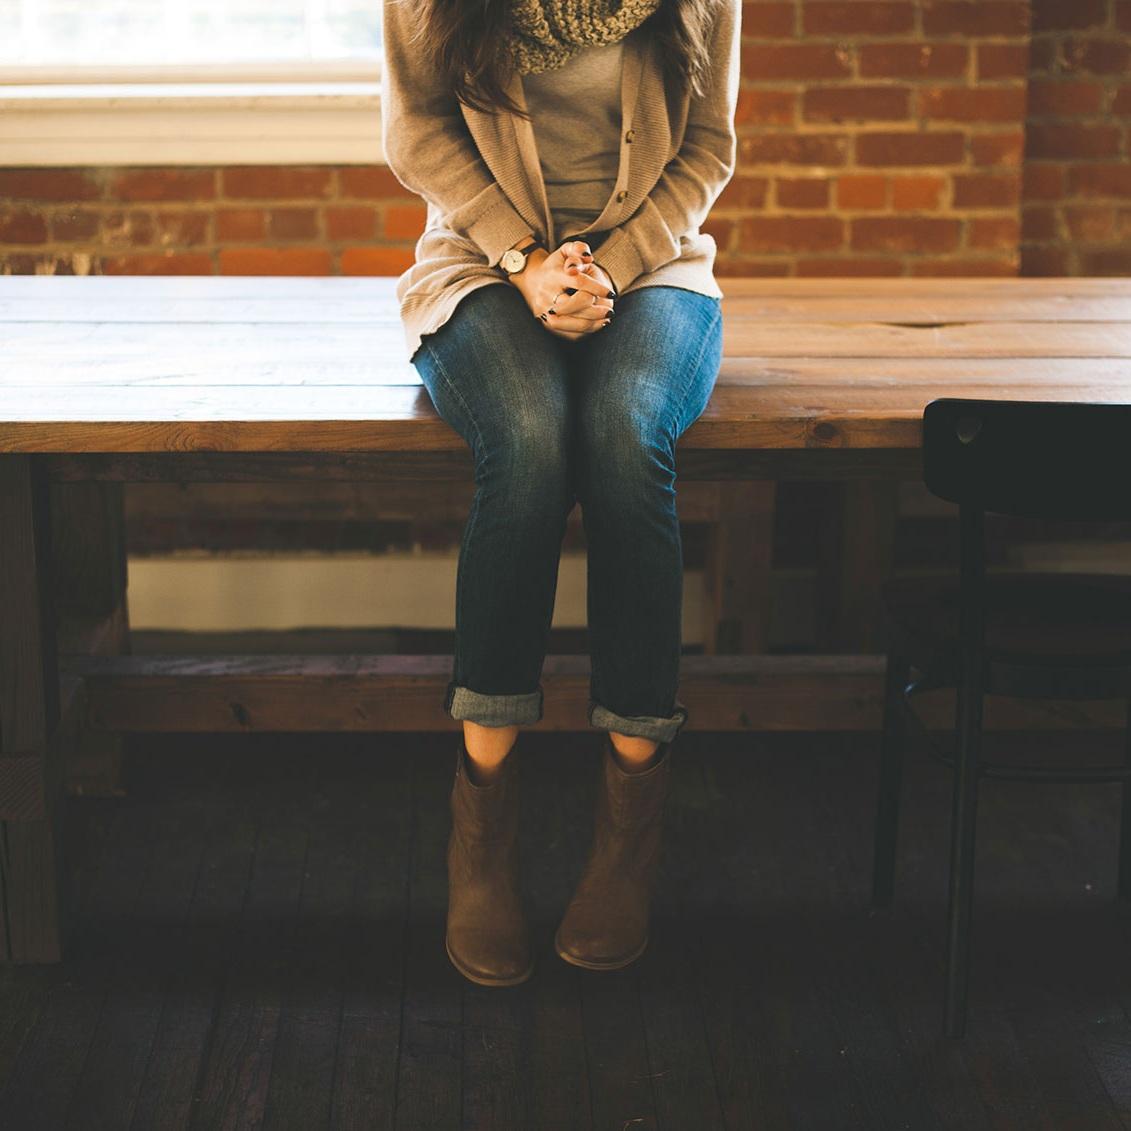 woman-sitting-on-table-stocksnap.jpg